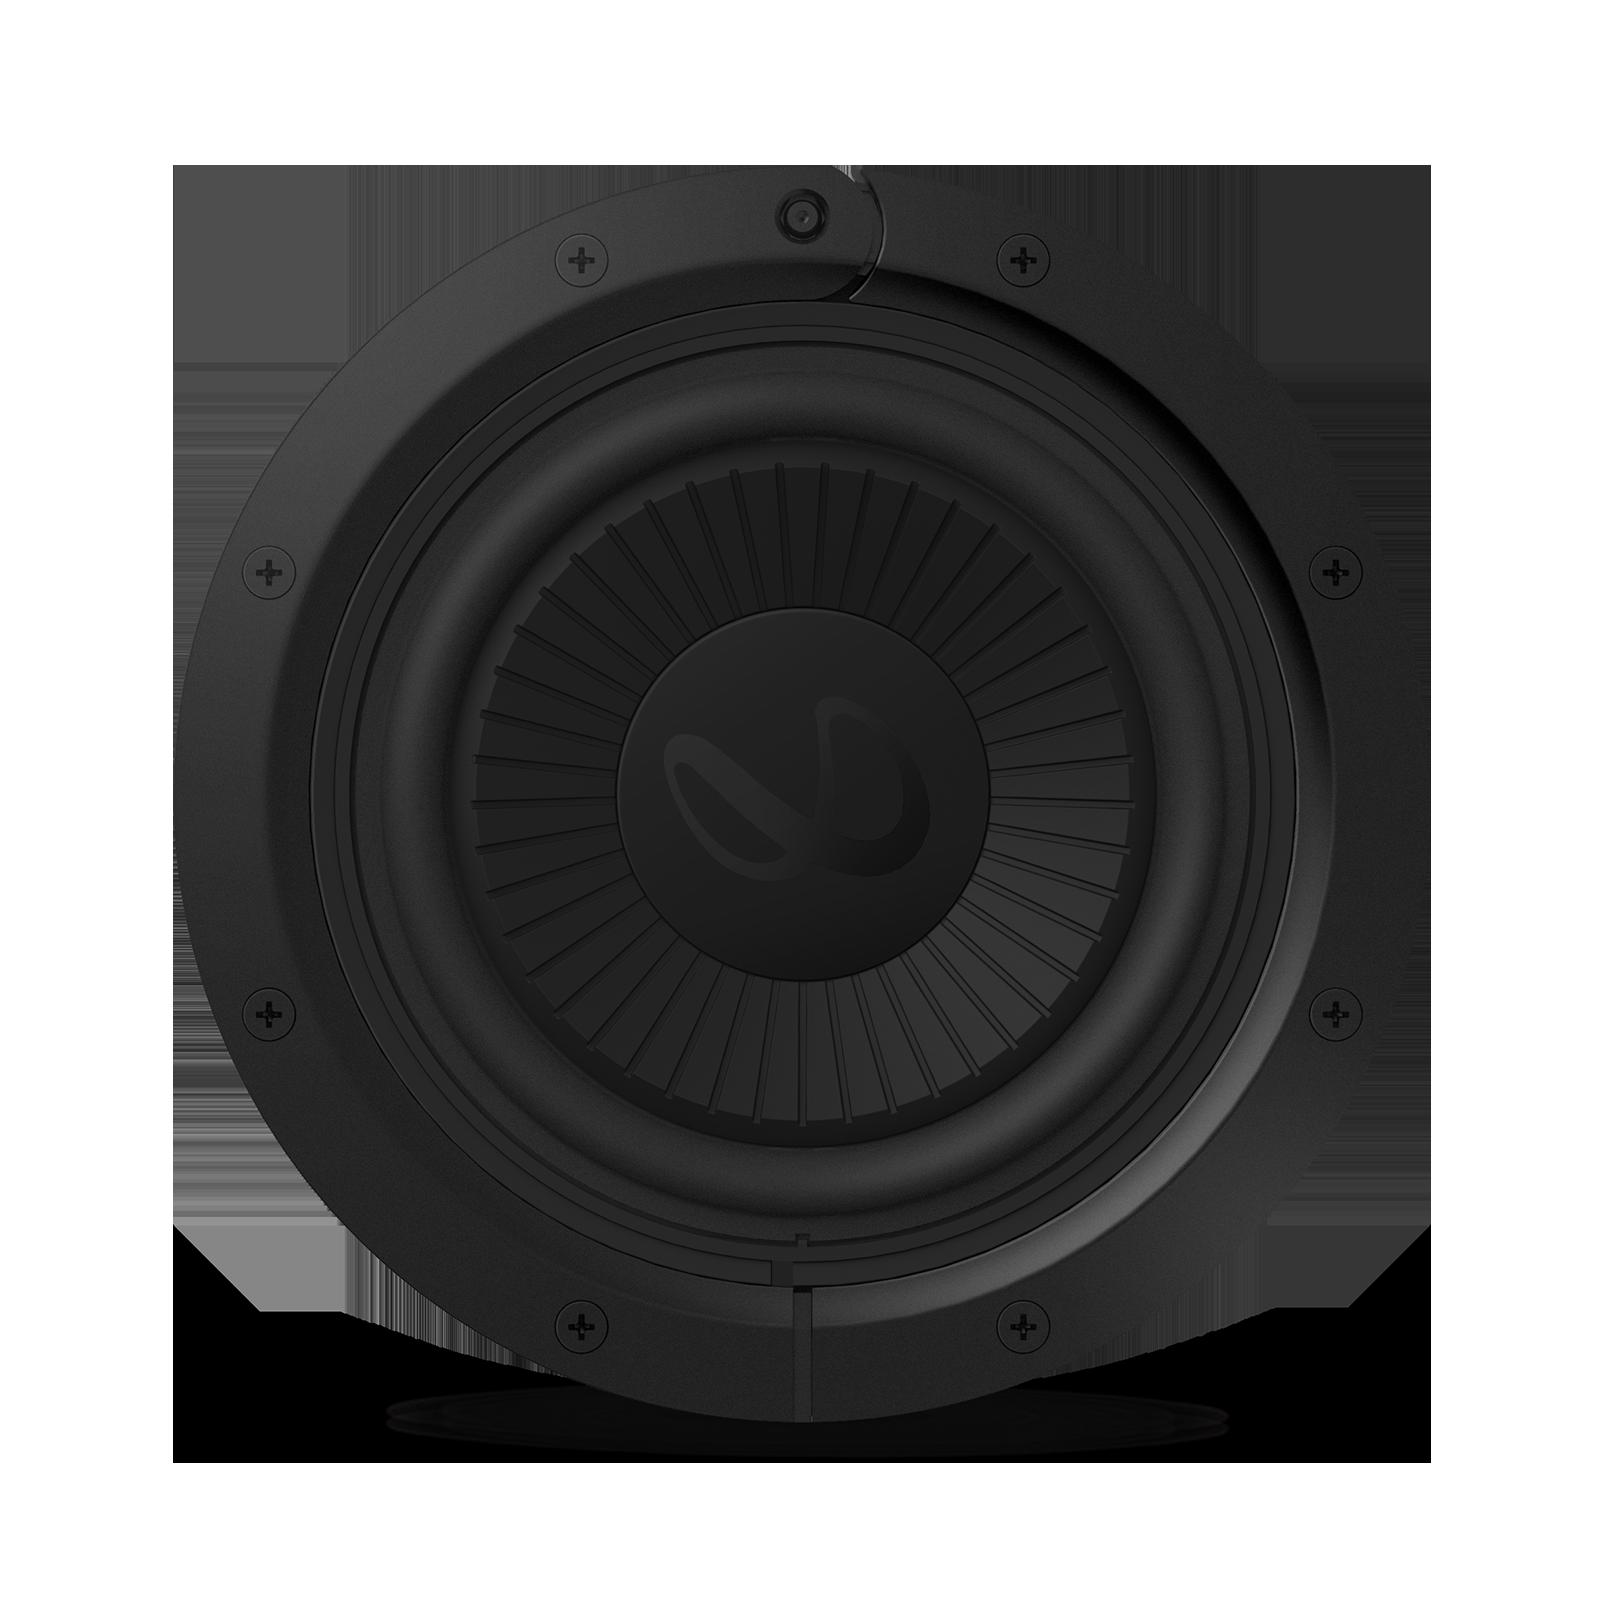 "Reference Flex Woofer 8s - Black - 8"" (200mm) adjustable depth car audio subwoofers optimized for factory location upgrades - Front"